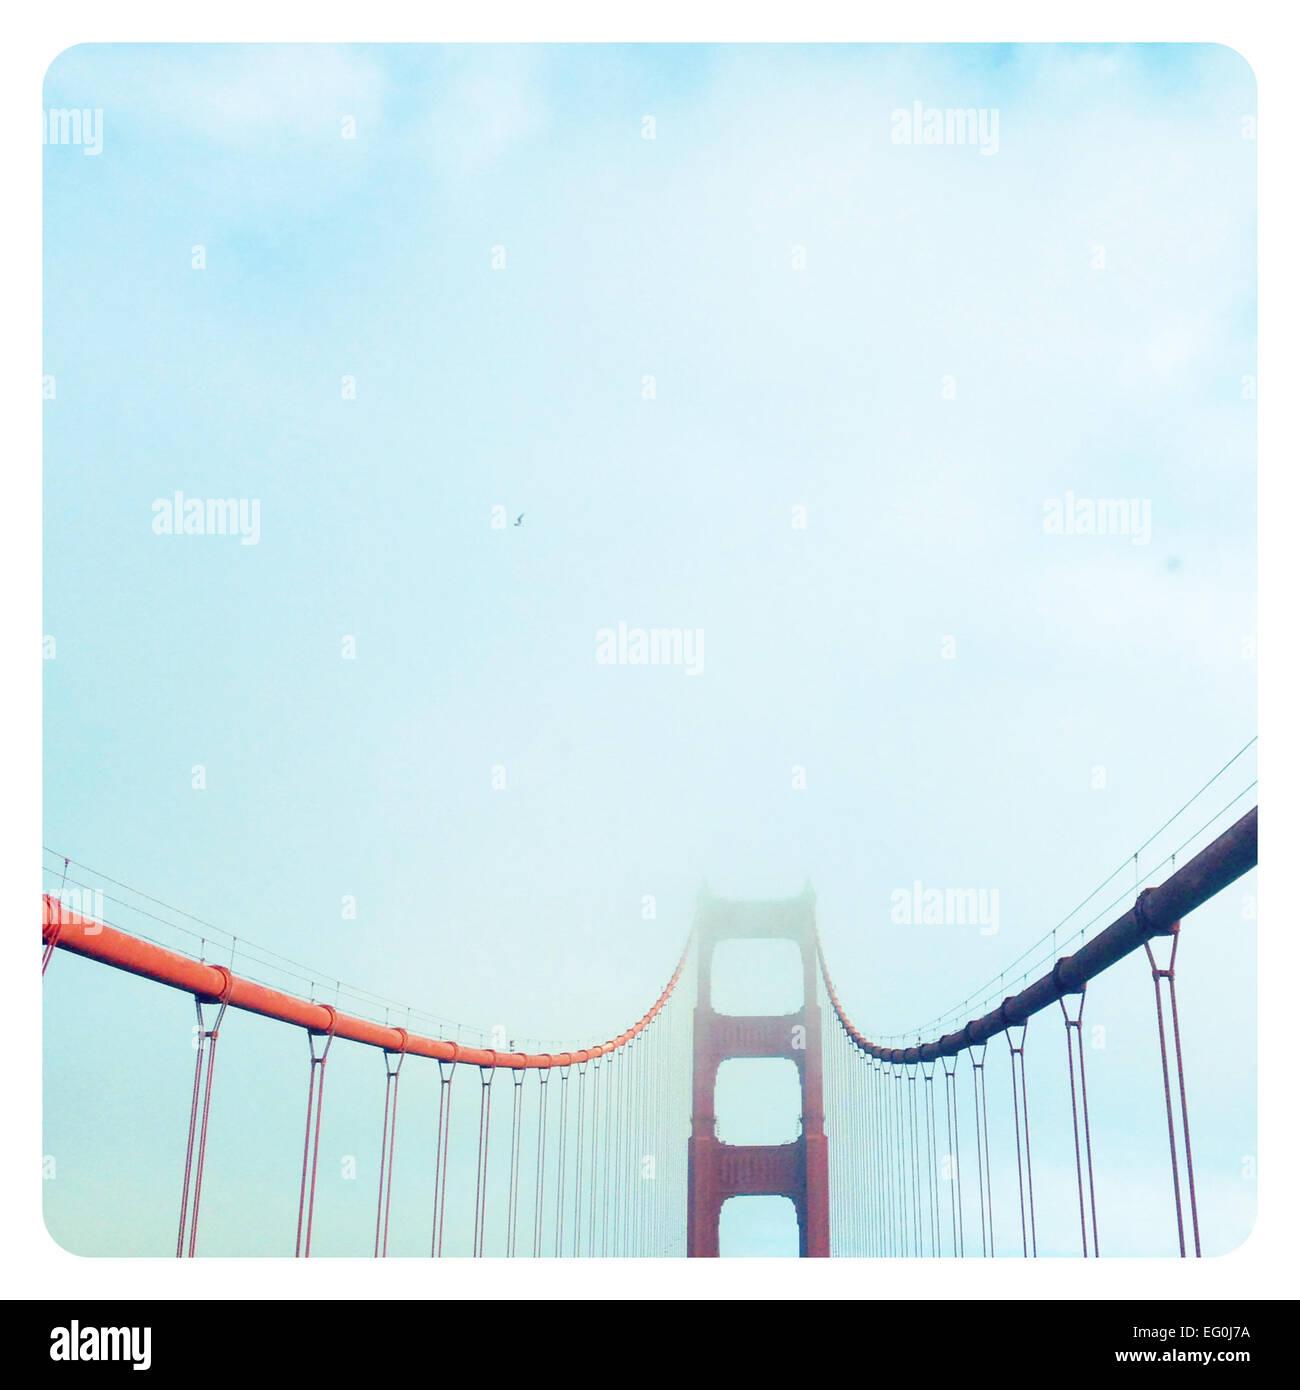 Golden Gate Bridge in Nebel, San Francisco, Kalifornien, Amerika, USA Stockbild